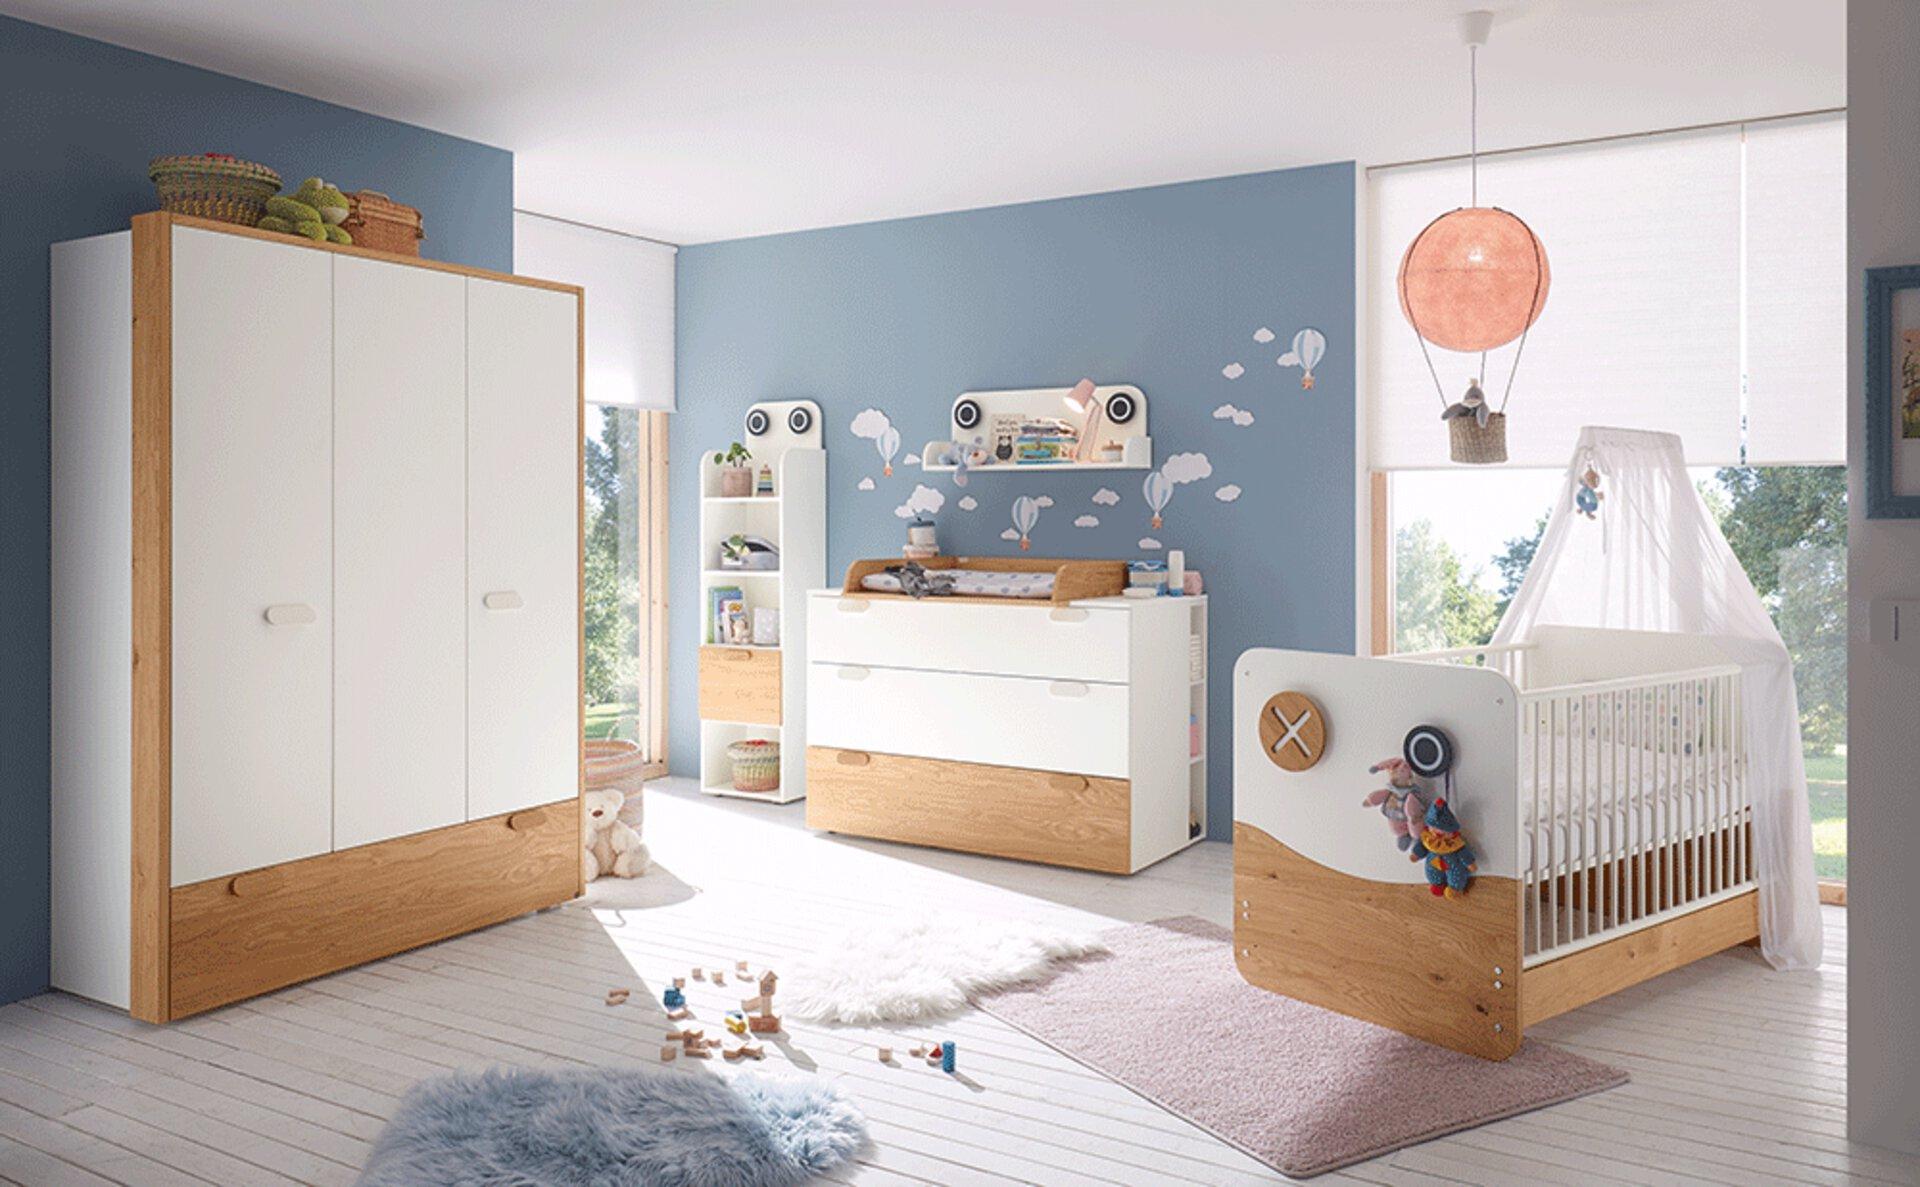 Babyzimmer MINIMO now! by Hülsta Holzwerkstoff 1 x 1 x 1 cm